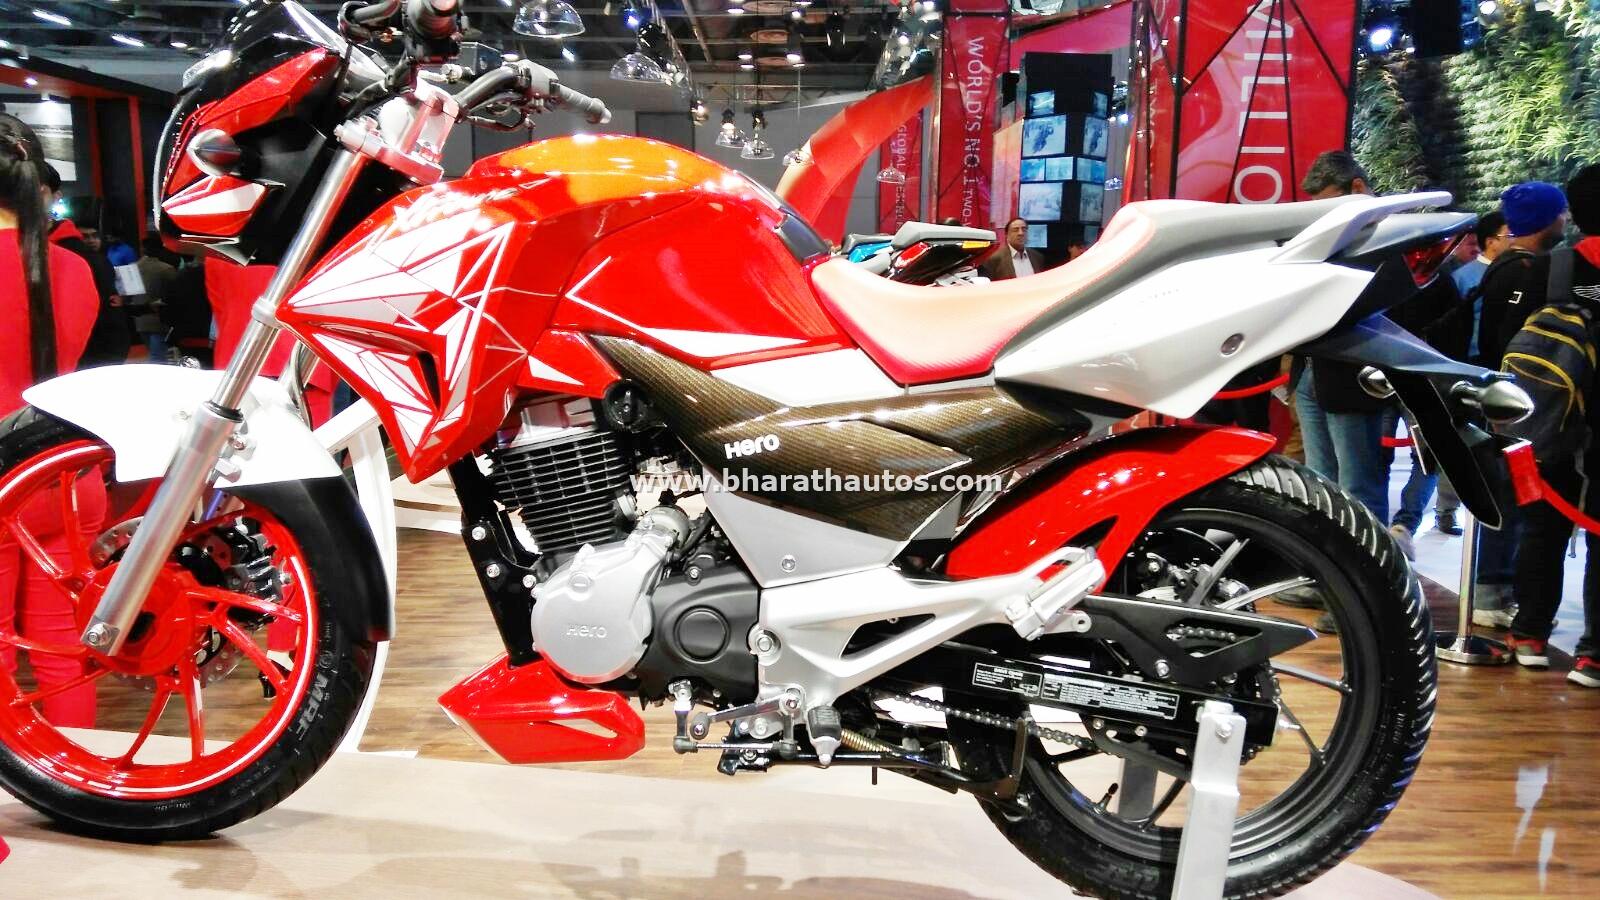 Hero Xtreme 200 S debuts at 13th Auto Expo 2016